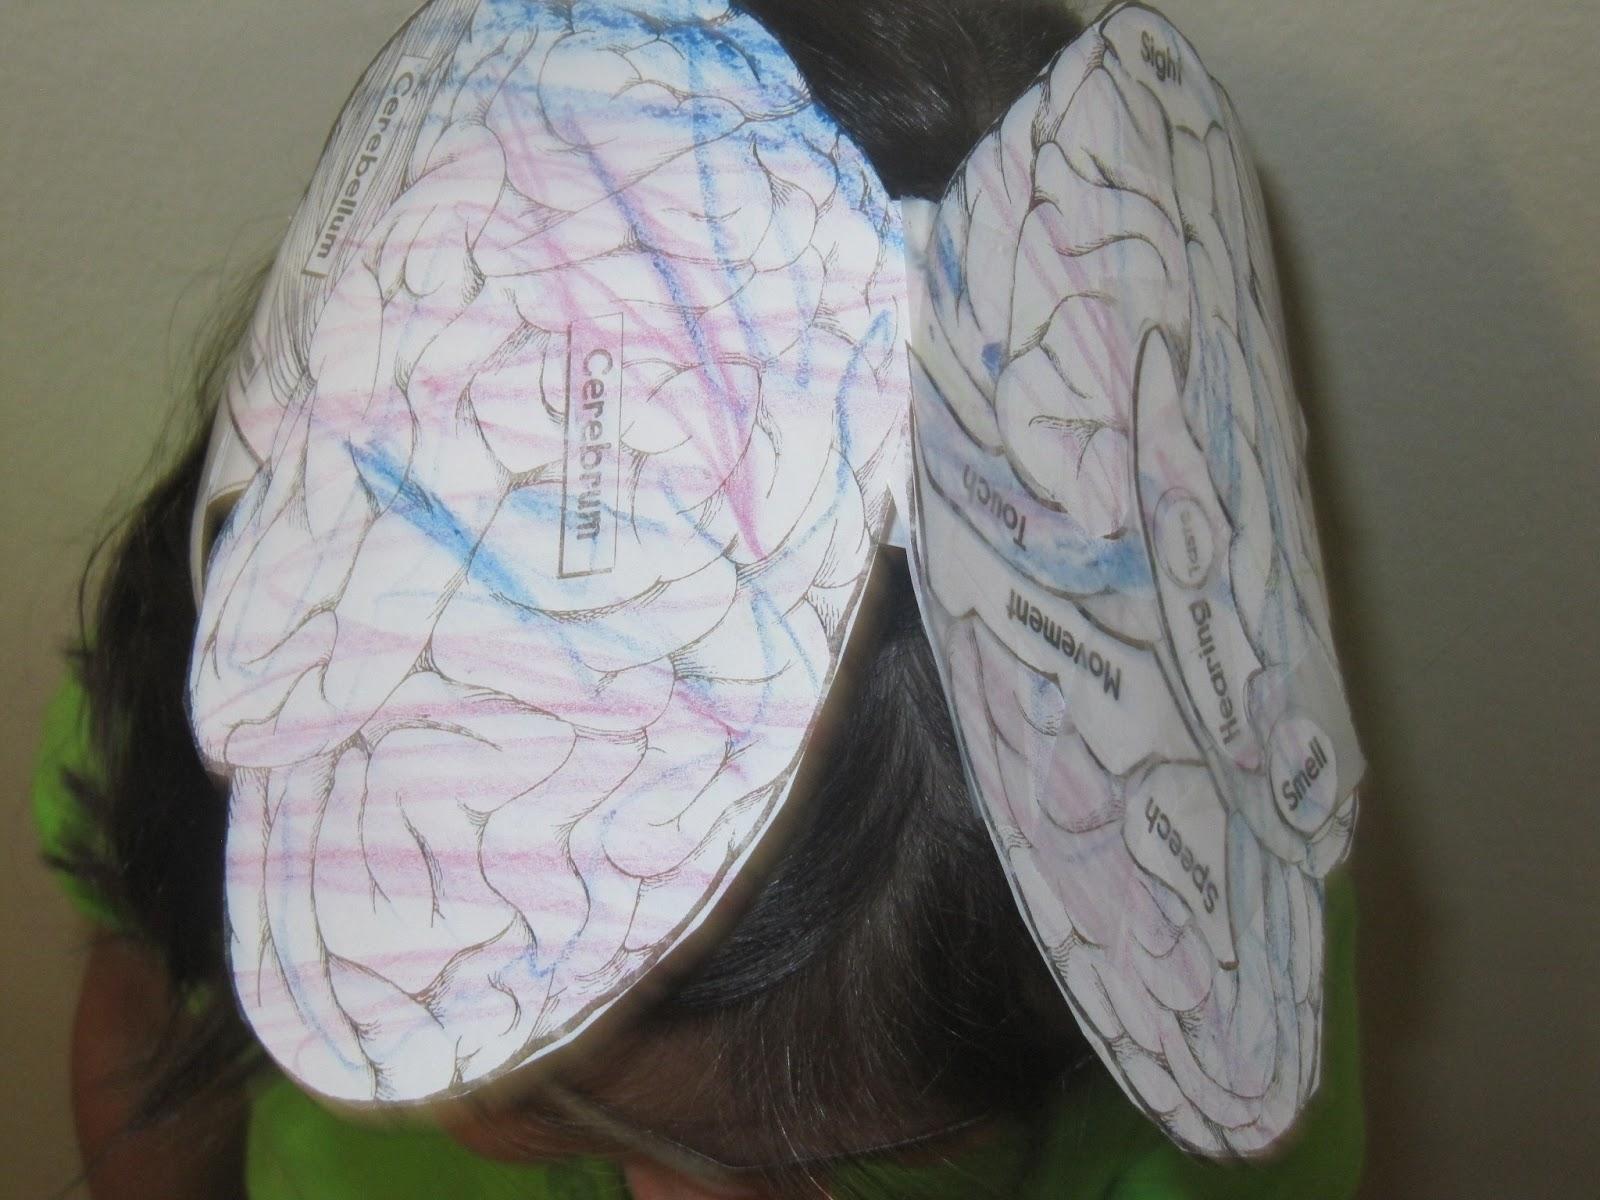 jewish homeschool in nyc  sunday science  brain hat